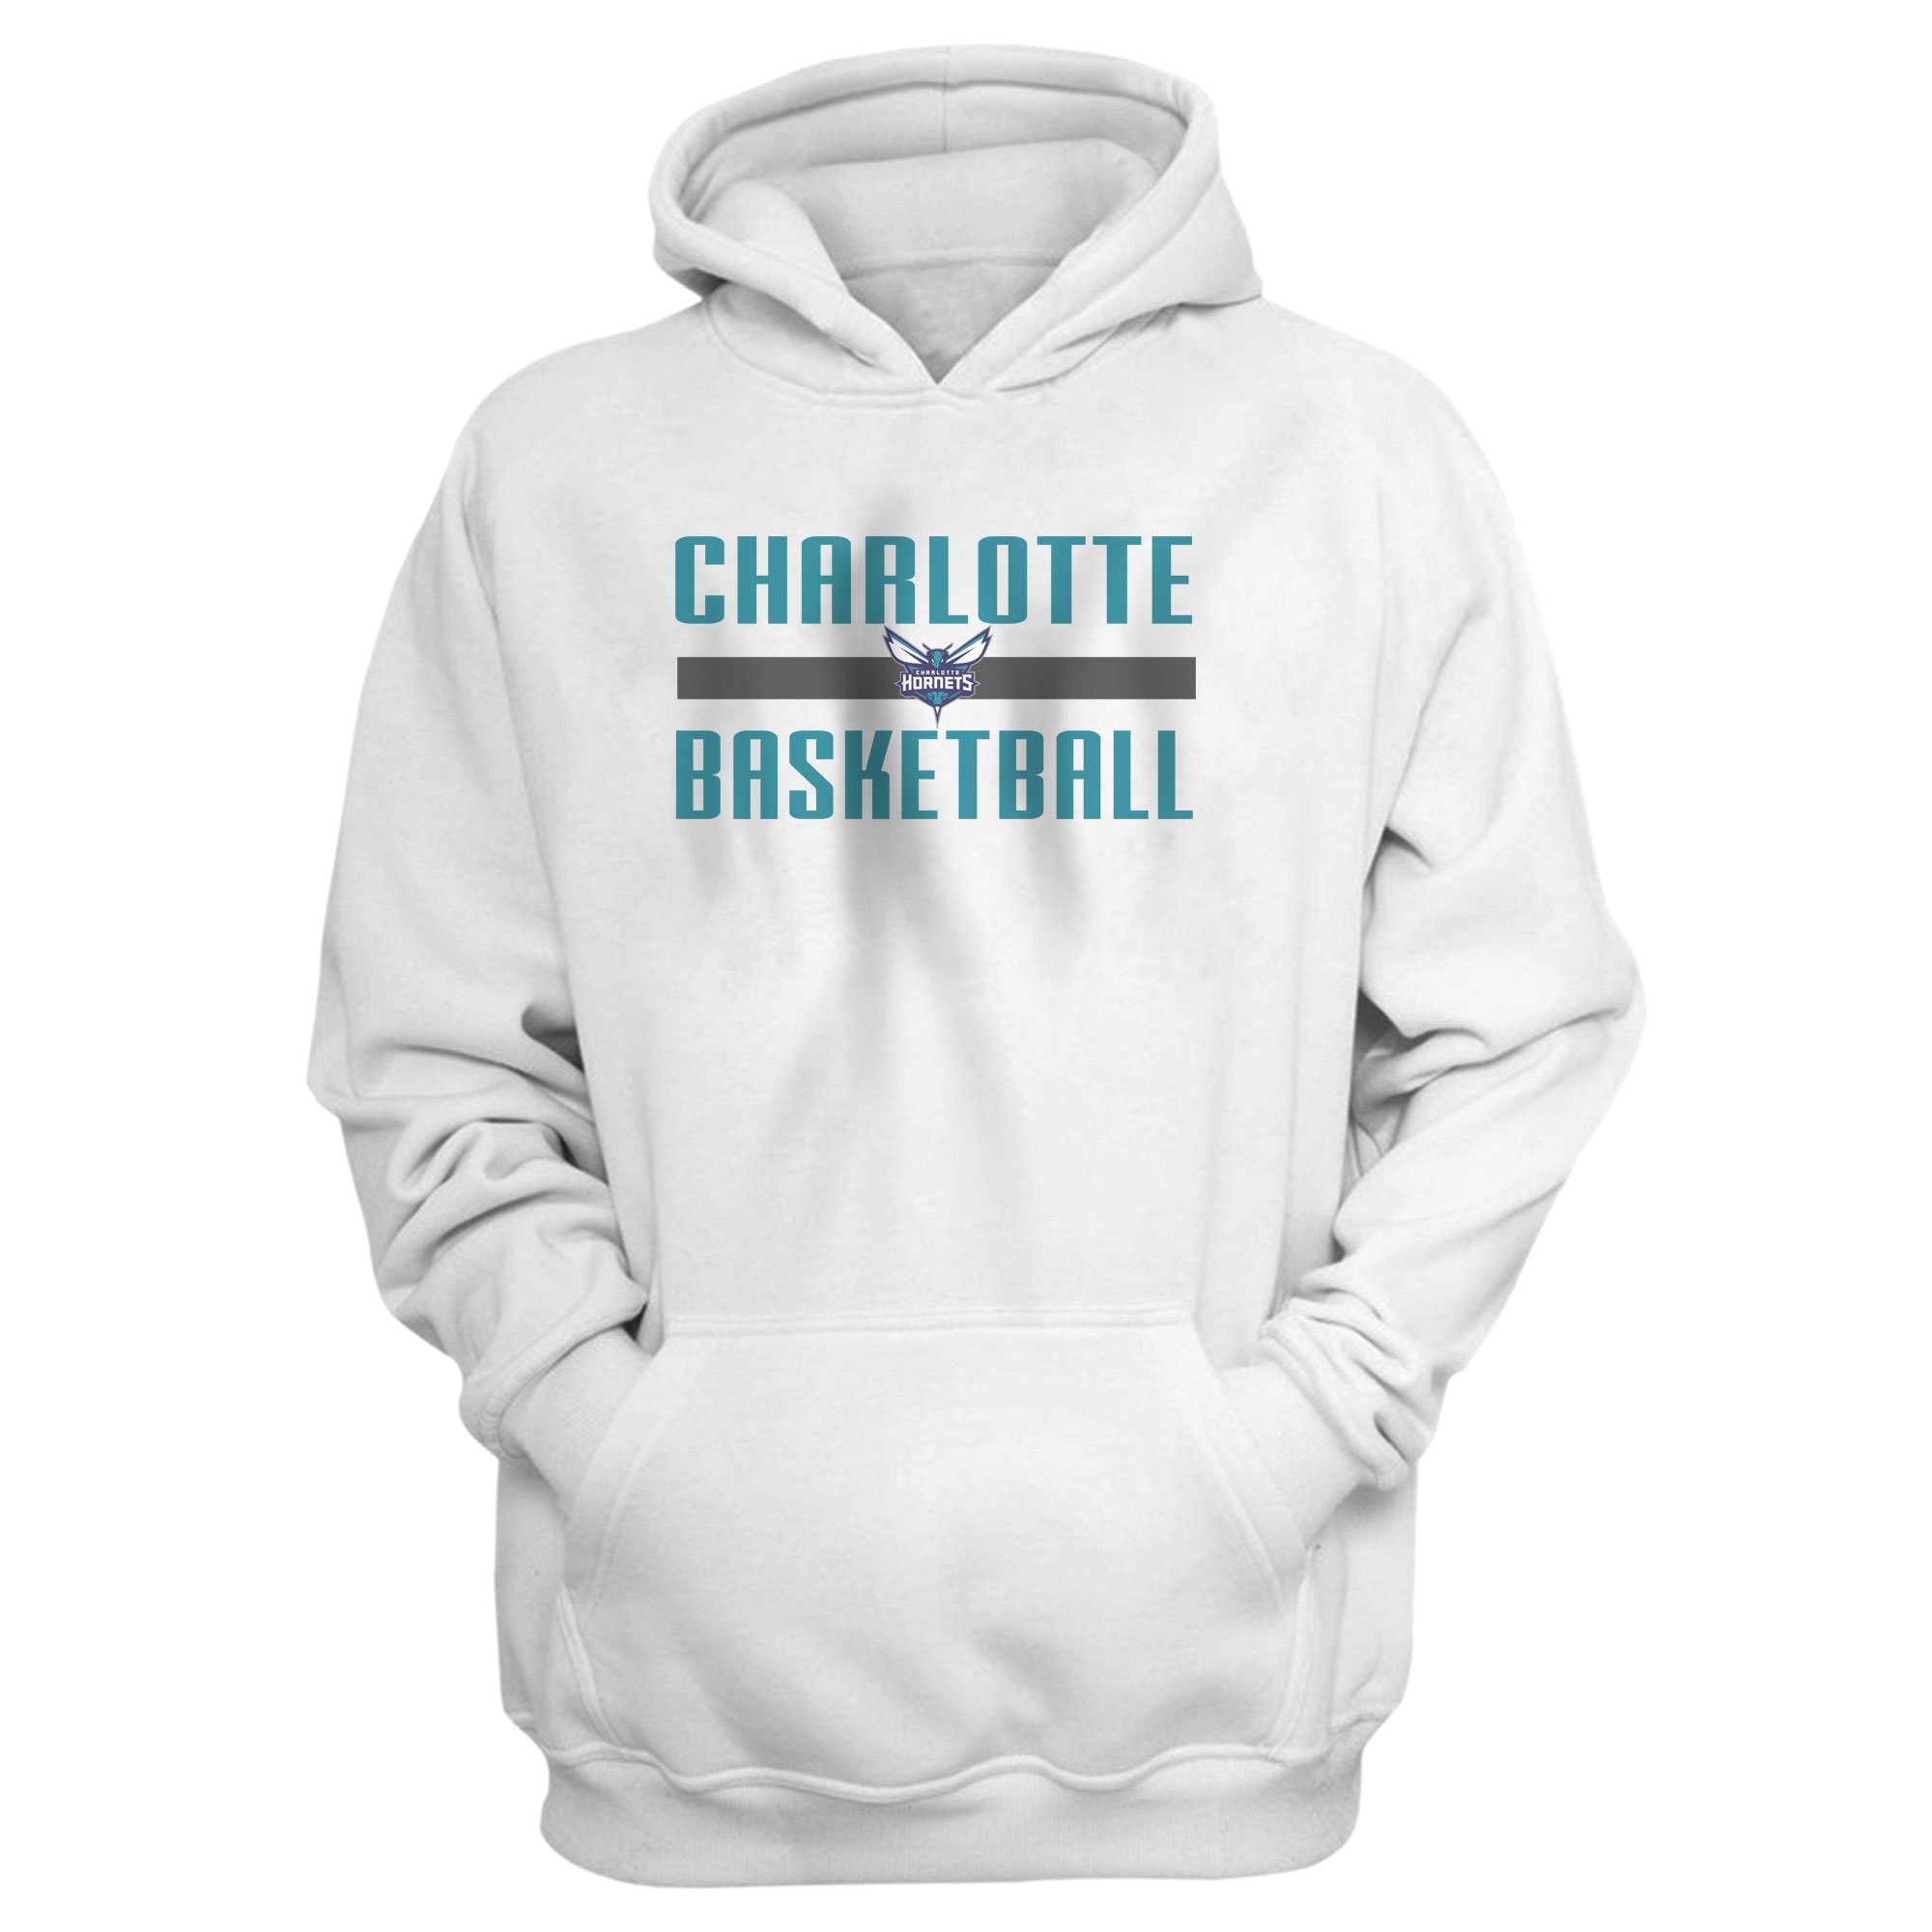 Charlotte Basketball Hoodie (HD-GRY-NP-charlotte-basketball-653)